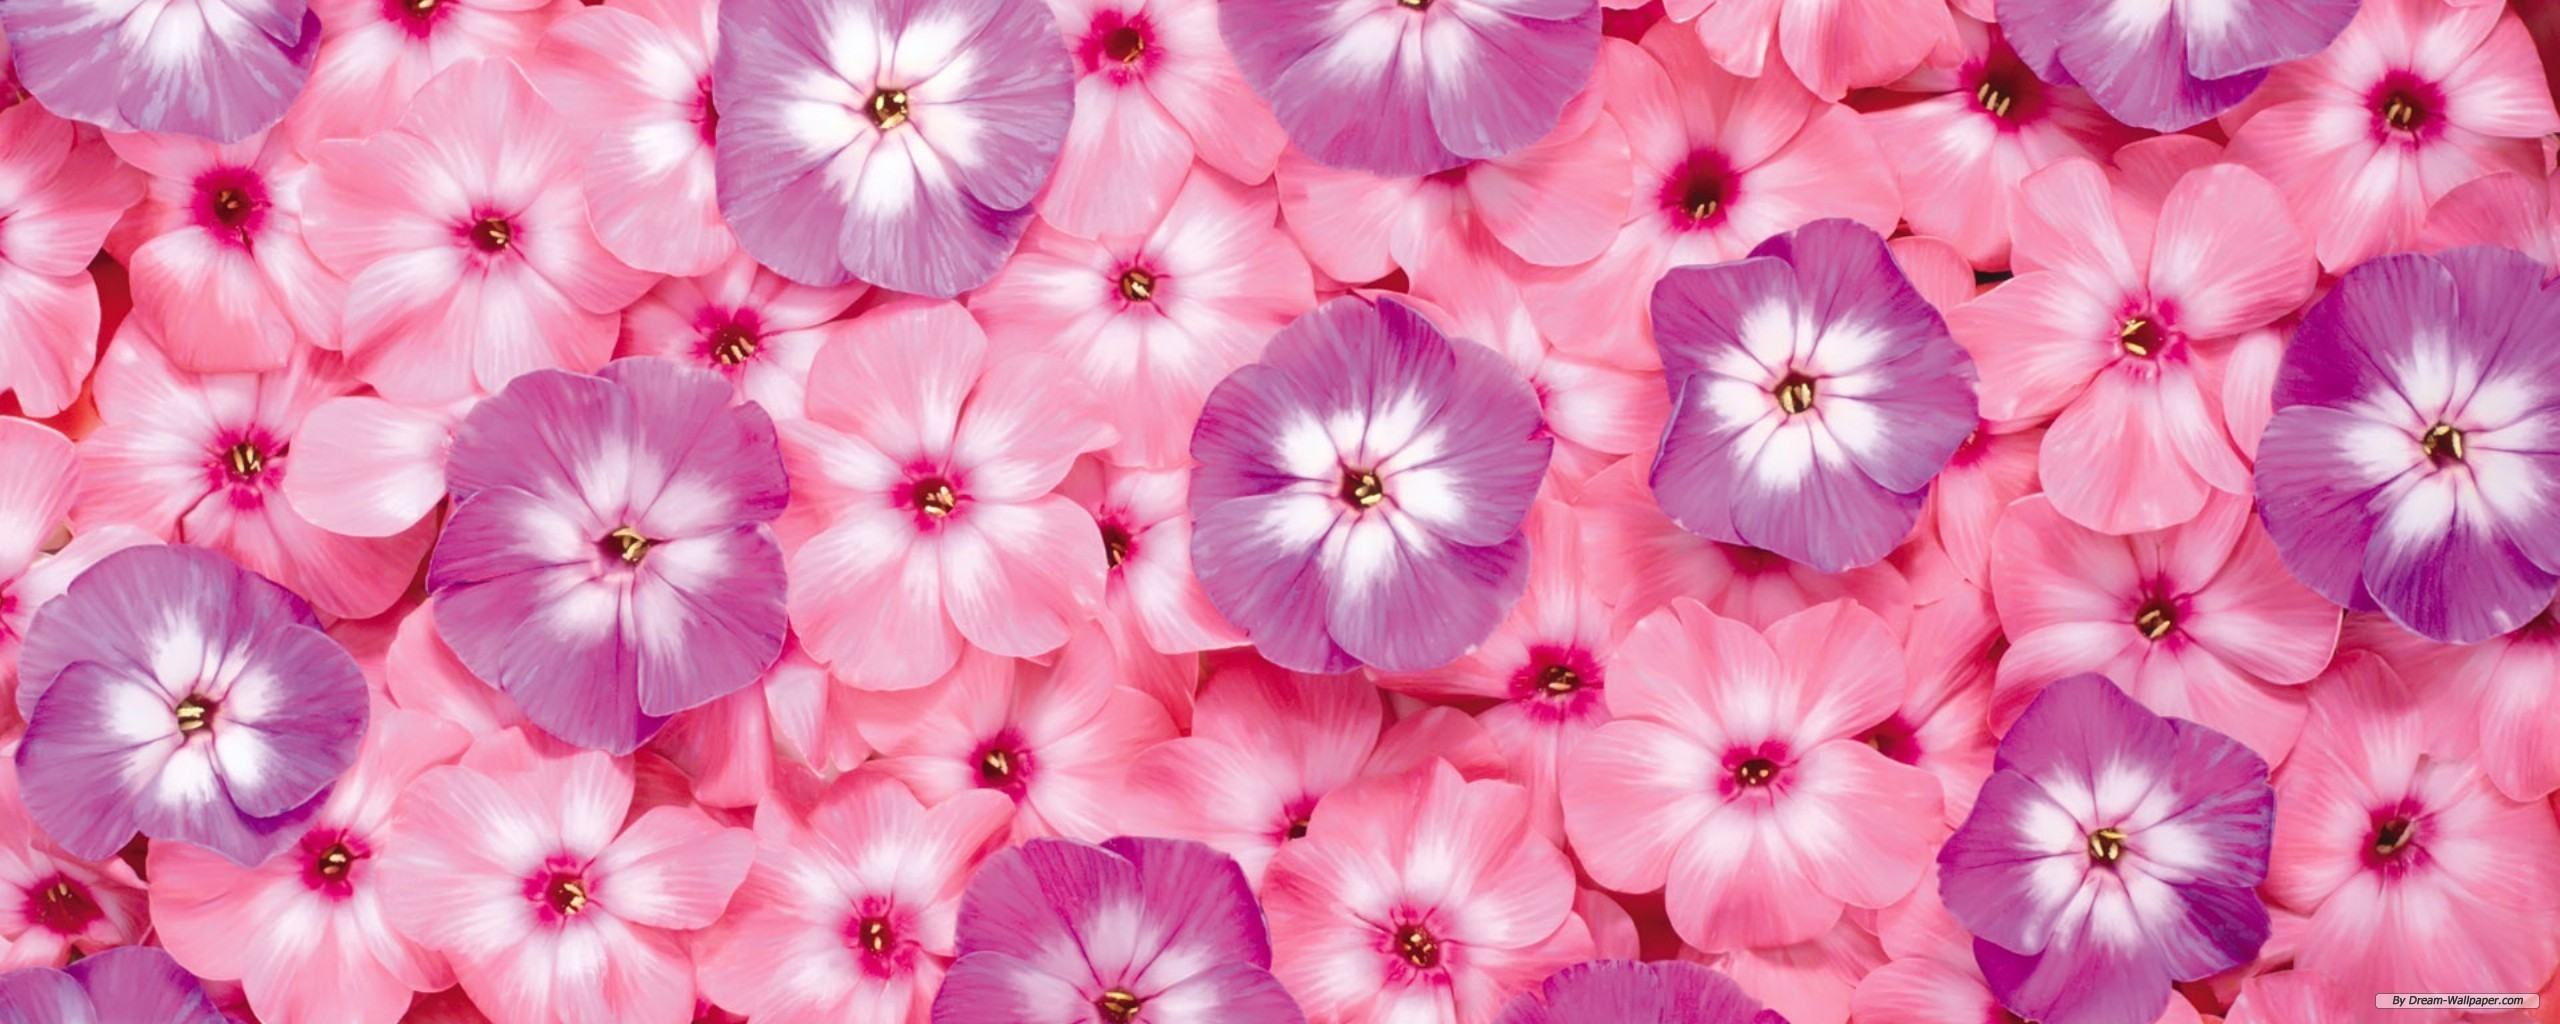 Flower wallpaper download